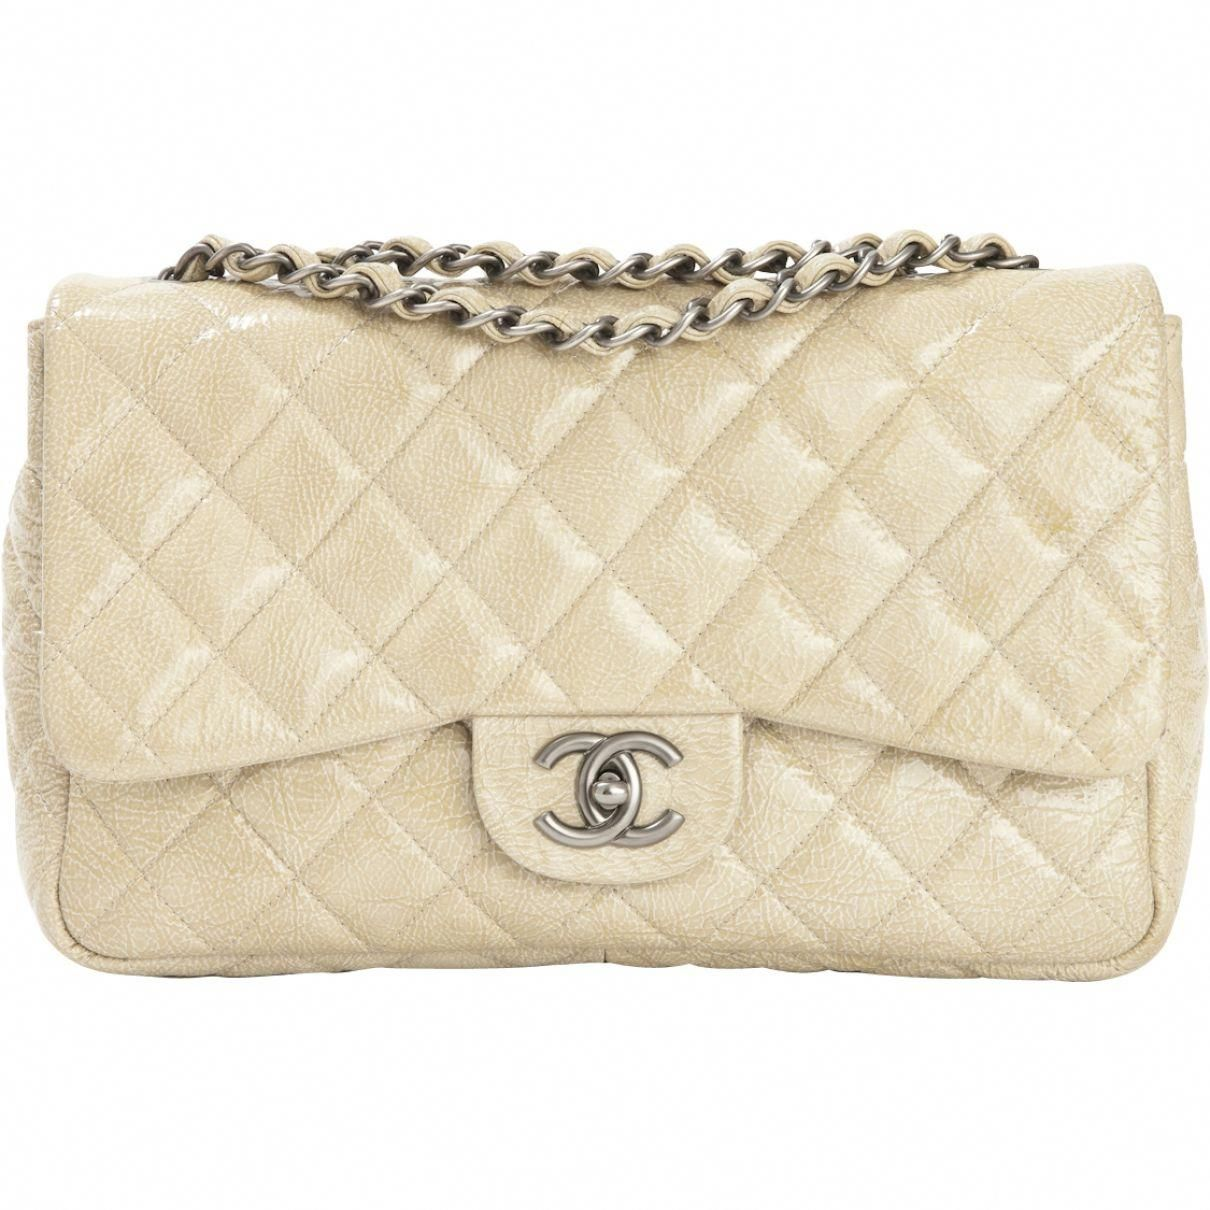 4155ce0f47d3 Chanel Beige Leather Handbag Timeless | Vestiaire Collective  #womenhandbagsResources